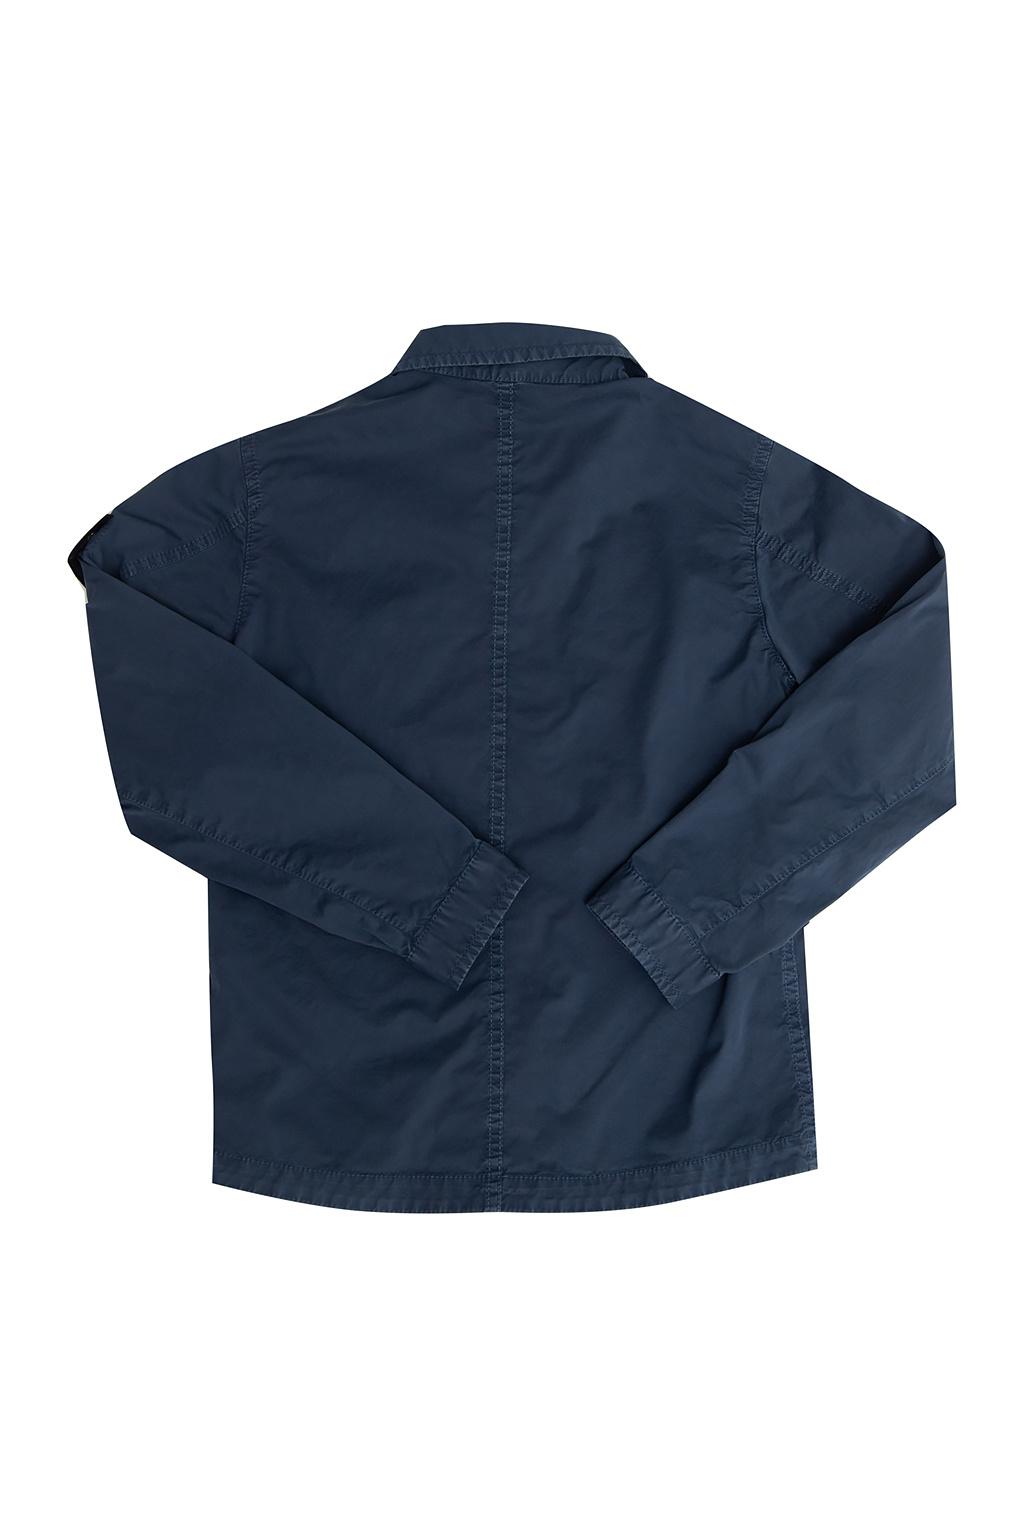 Stone Island Kids Jacket with pockets